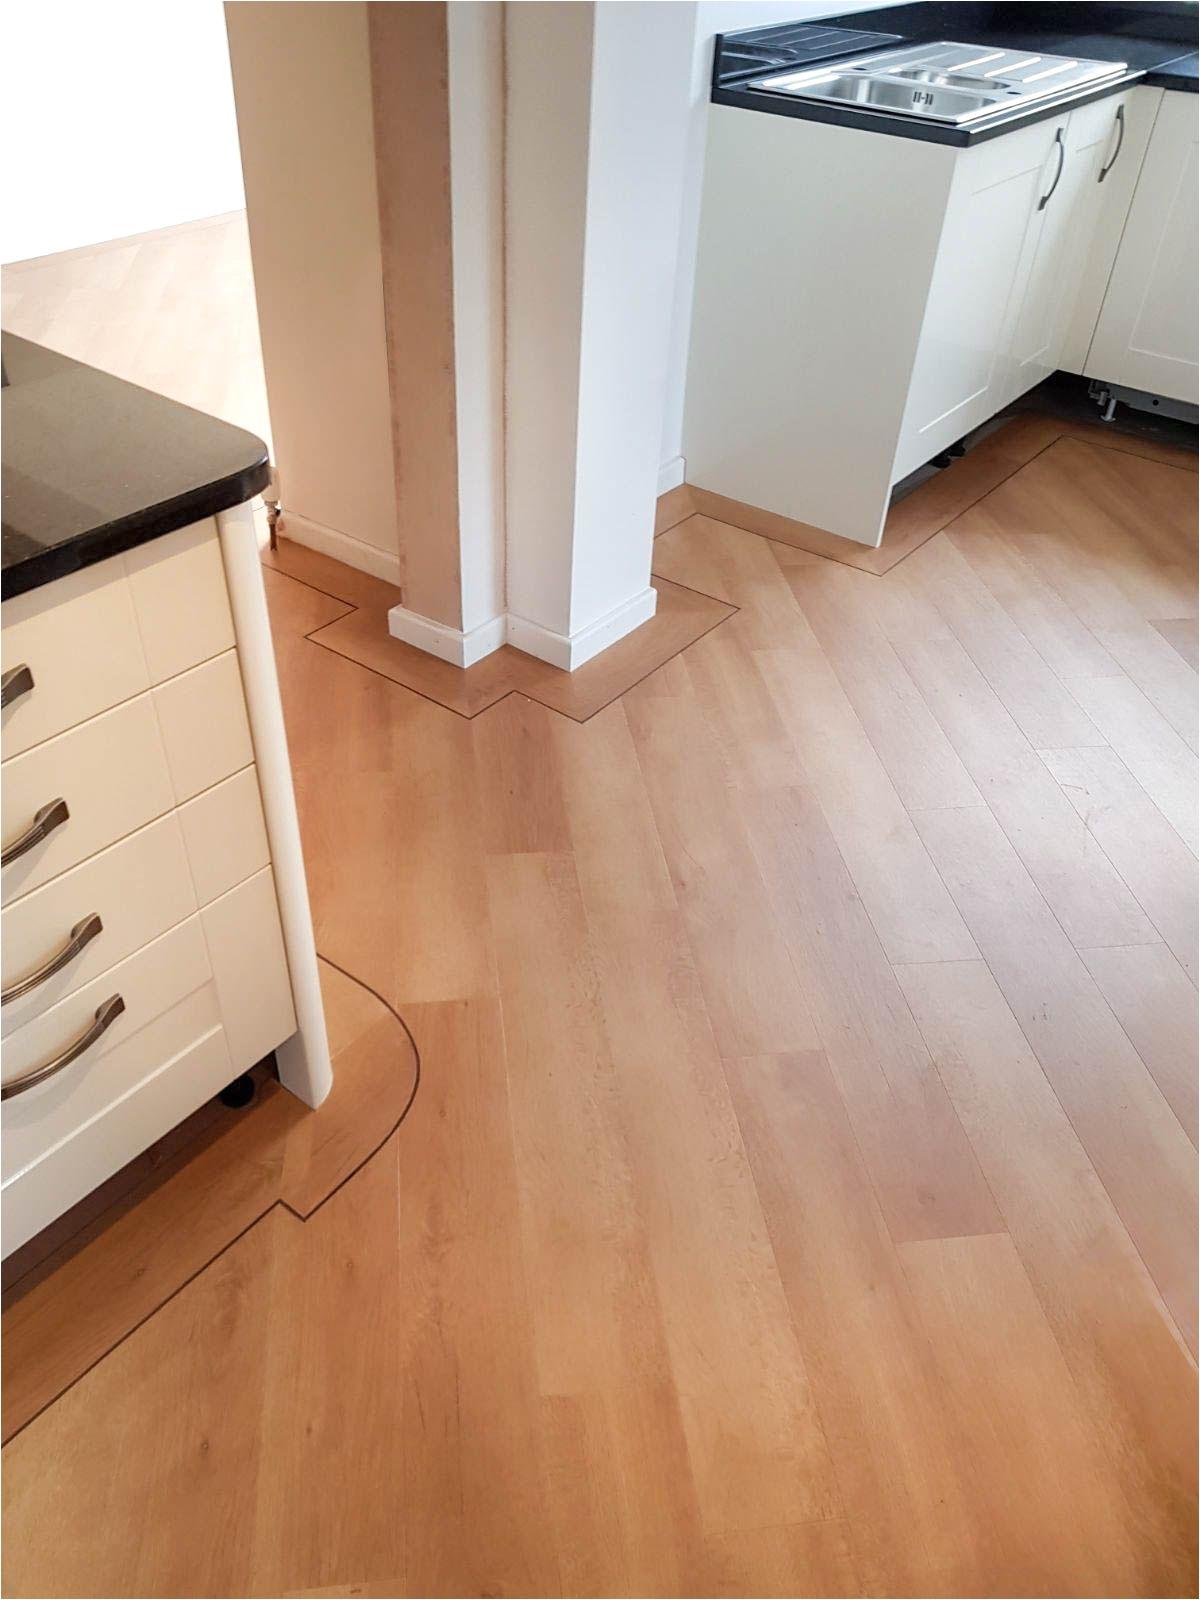 Is Karndean Vinyl Flooring Waterproof Kitchen Vinyl Flooring Karndean Design Flooring Opus Wp314 Cera